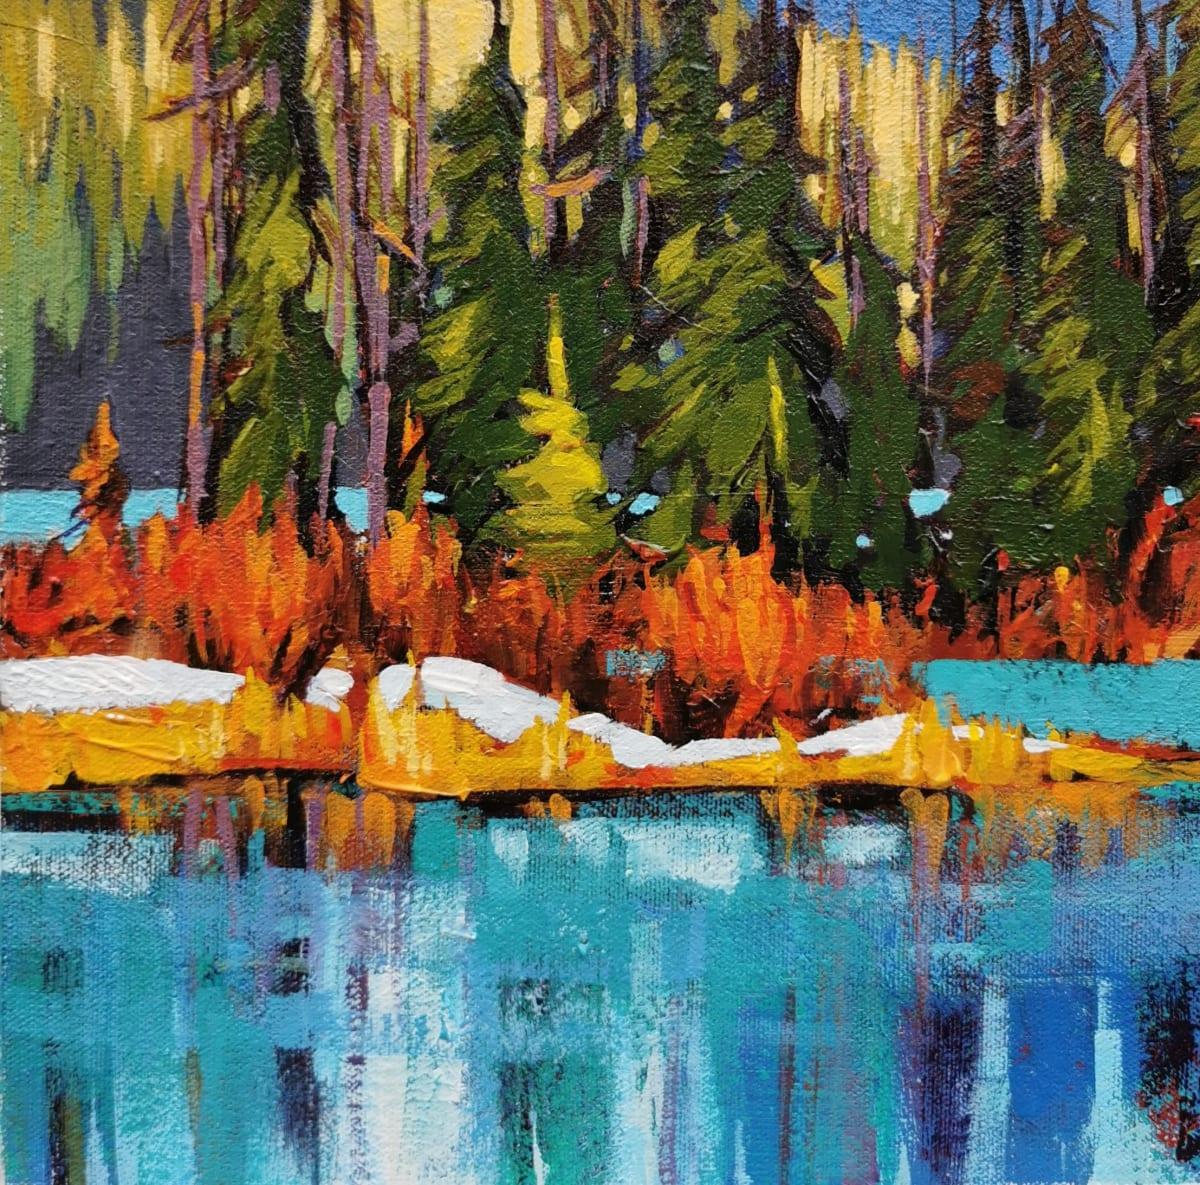 Vermilion Lakes Study I by Tatjana Mirkov-Popovicki